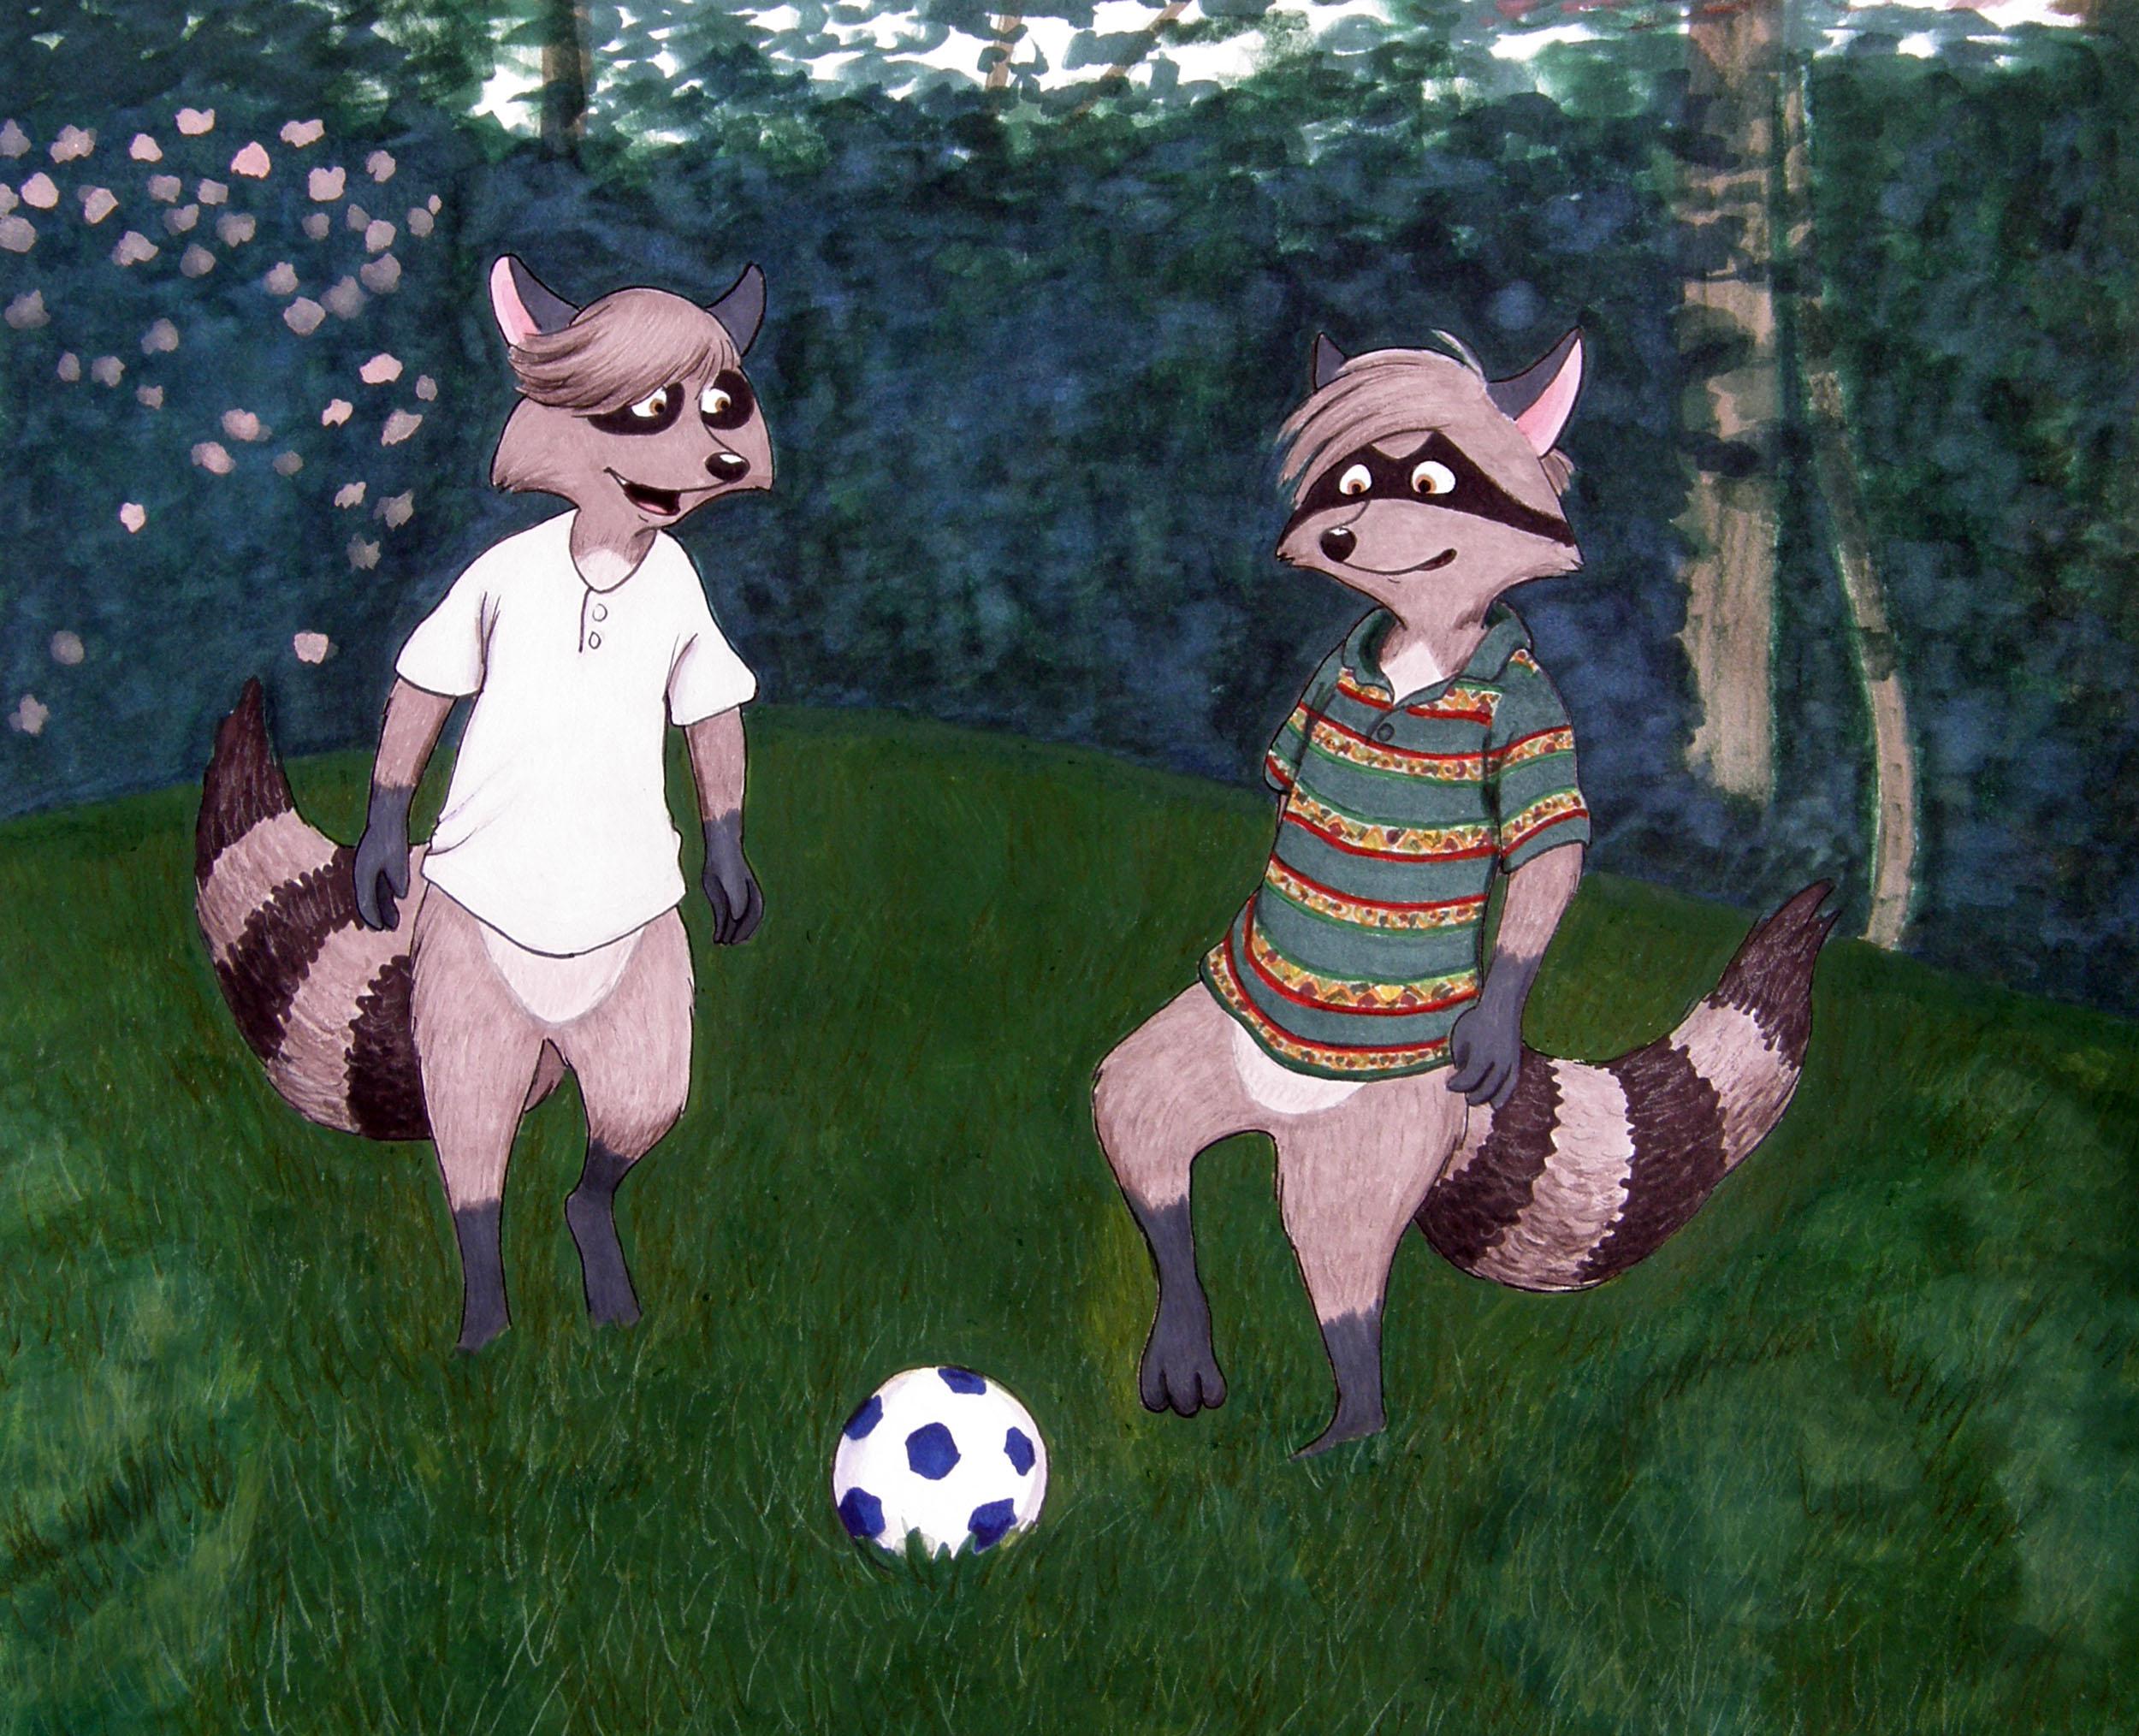 backyard soccer at dusk by christaphorac